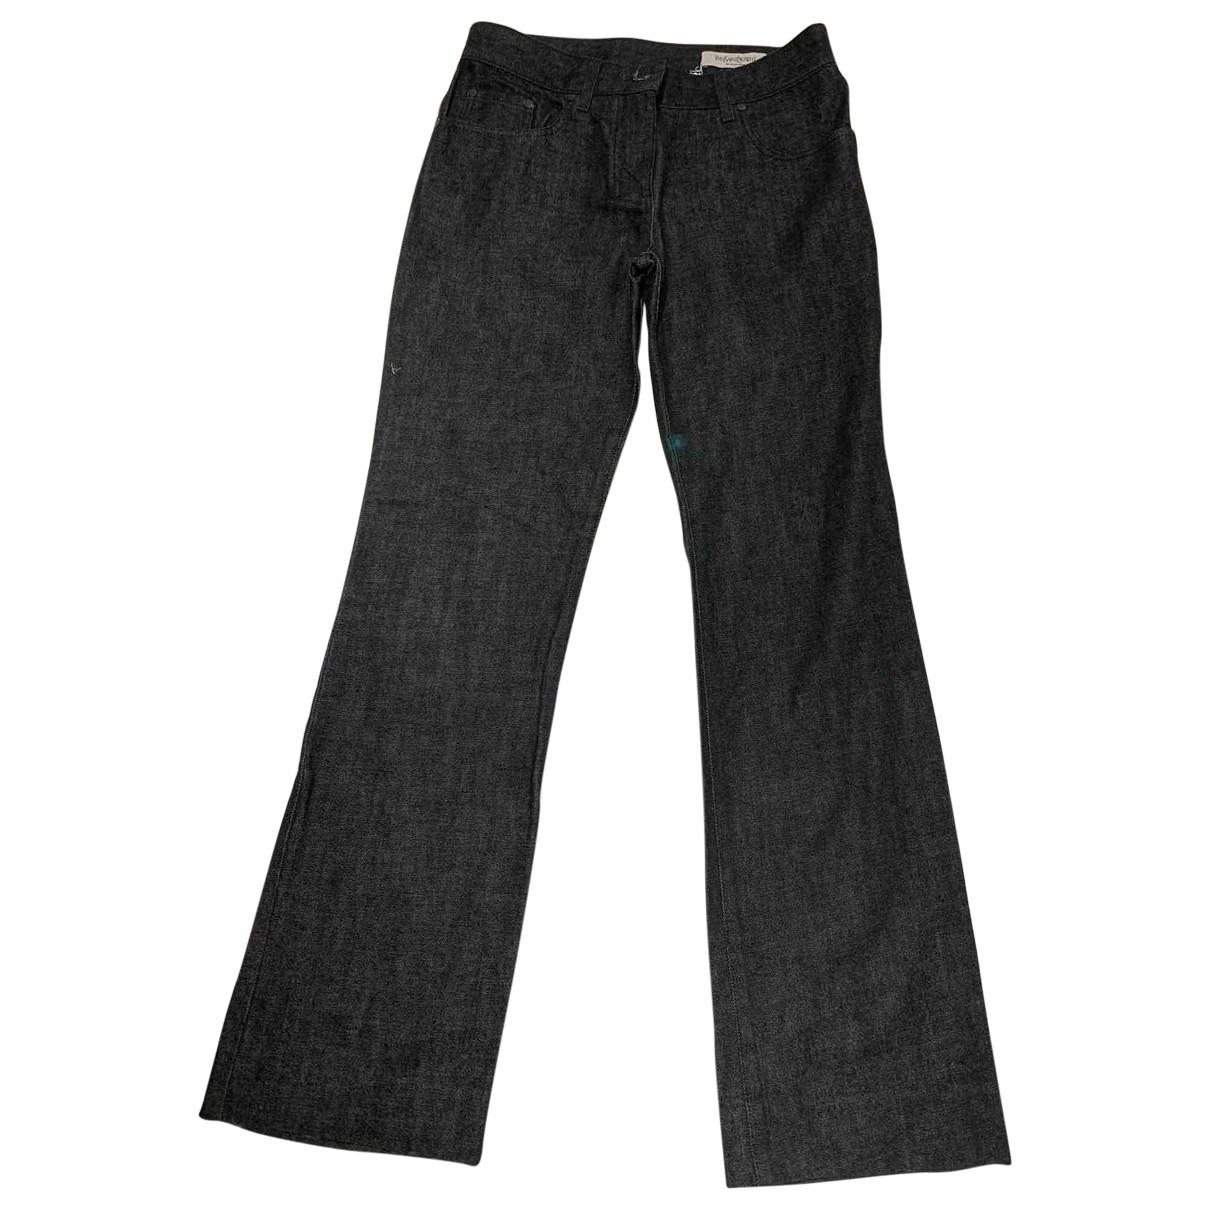 Yves Saint Laurent \N Grey Cotton Jeans for Women 38 FR